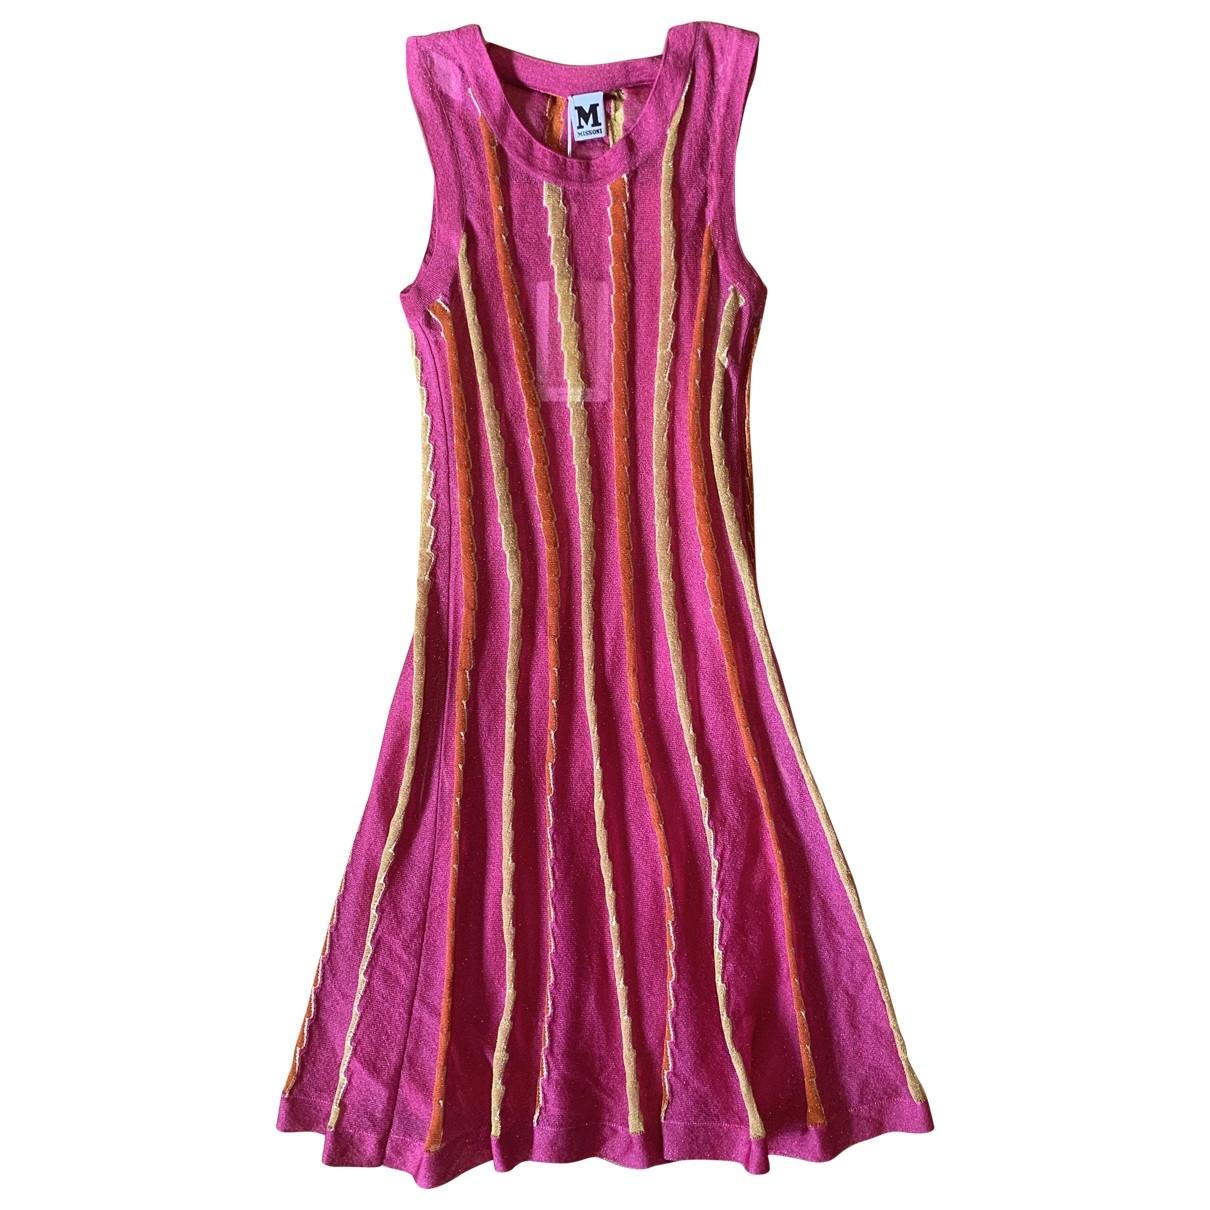 M Missoni \N Multicolour Cotton - elasthane dress for Women 40 IT